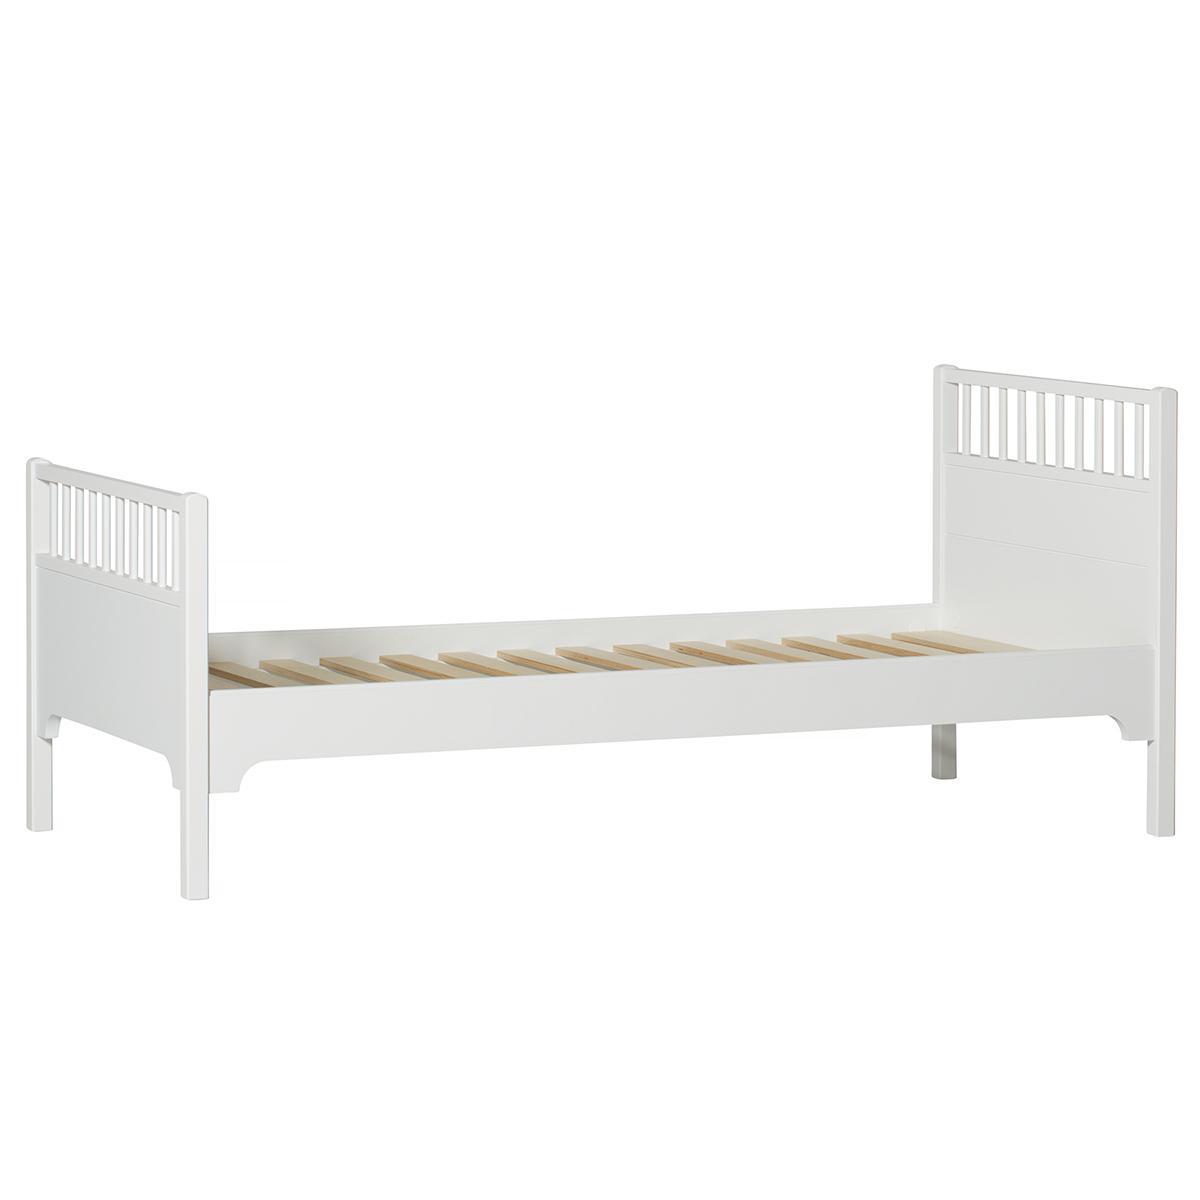 Lit 90x200 cm SEASIDE CLASSIC Oliver Furniture blanc